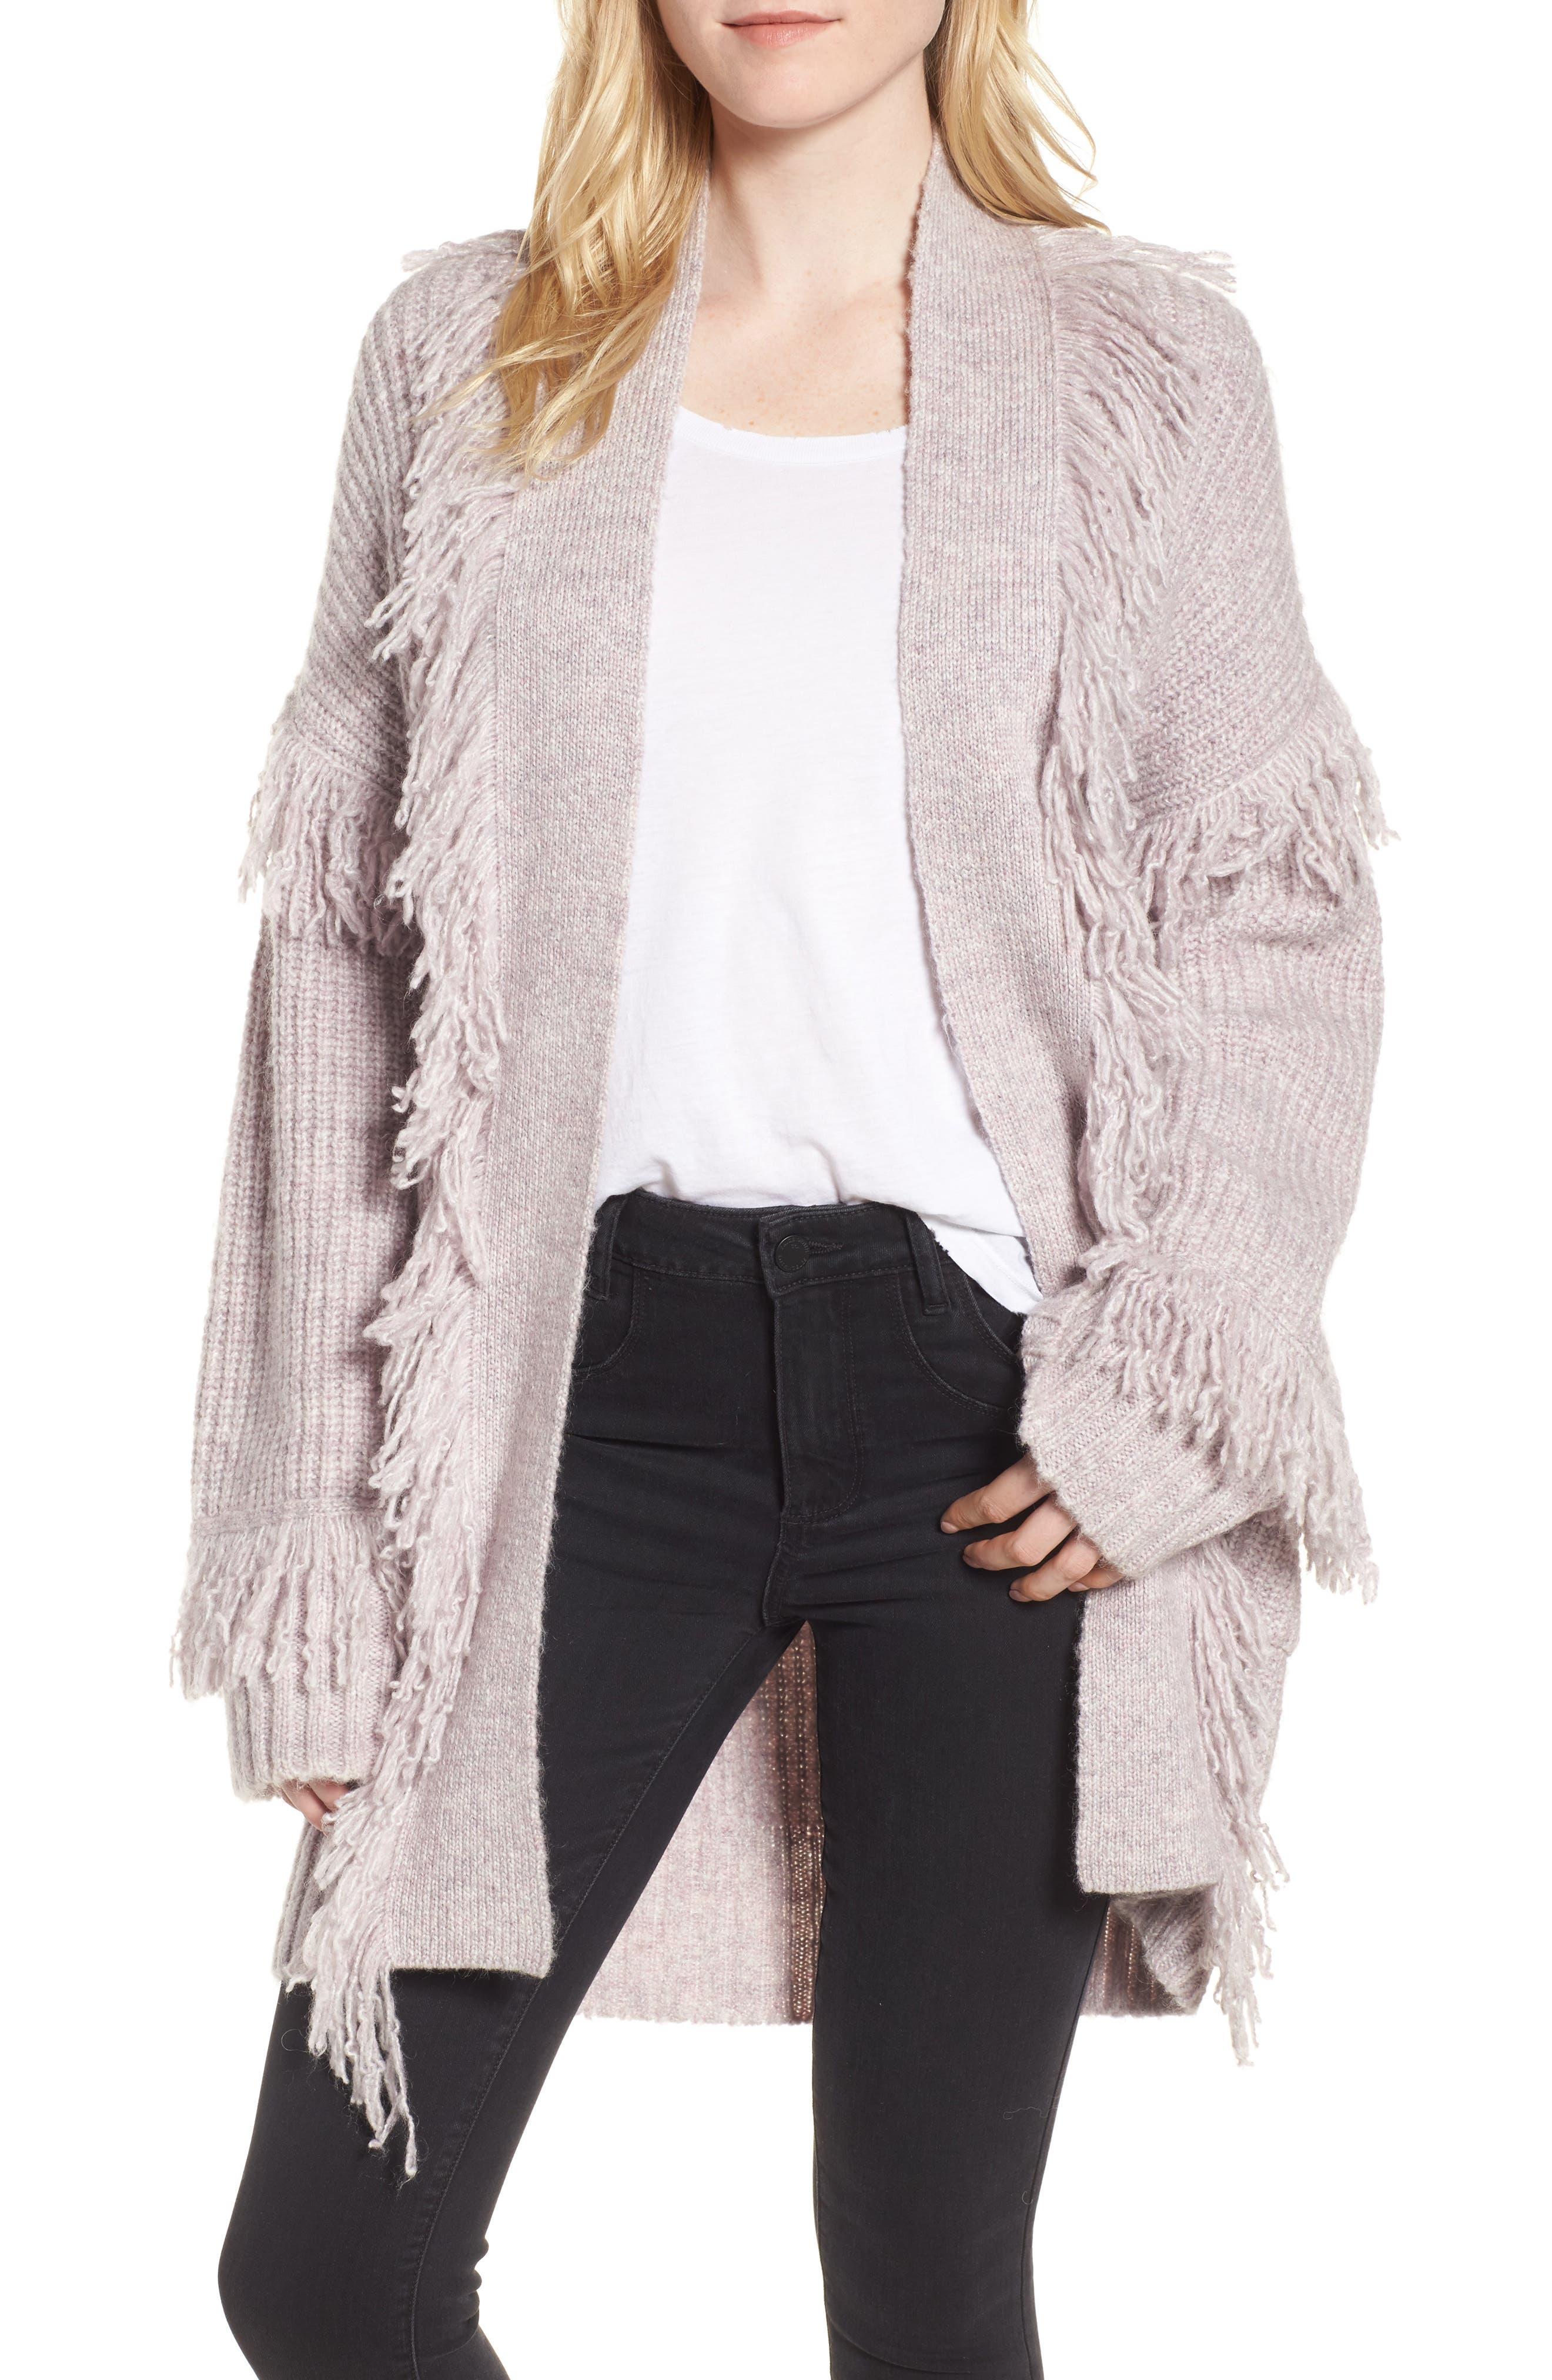 Berea Fringe Cardigan Sweater,                             Main thumbnail 1, color,                             684